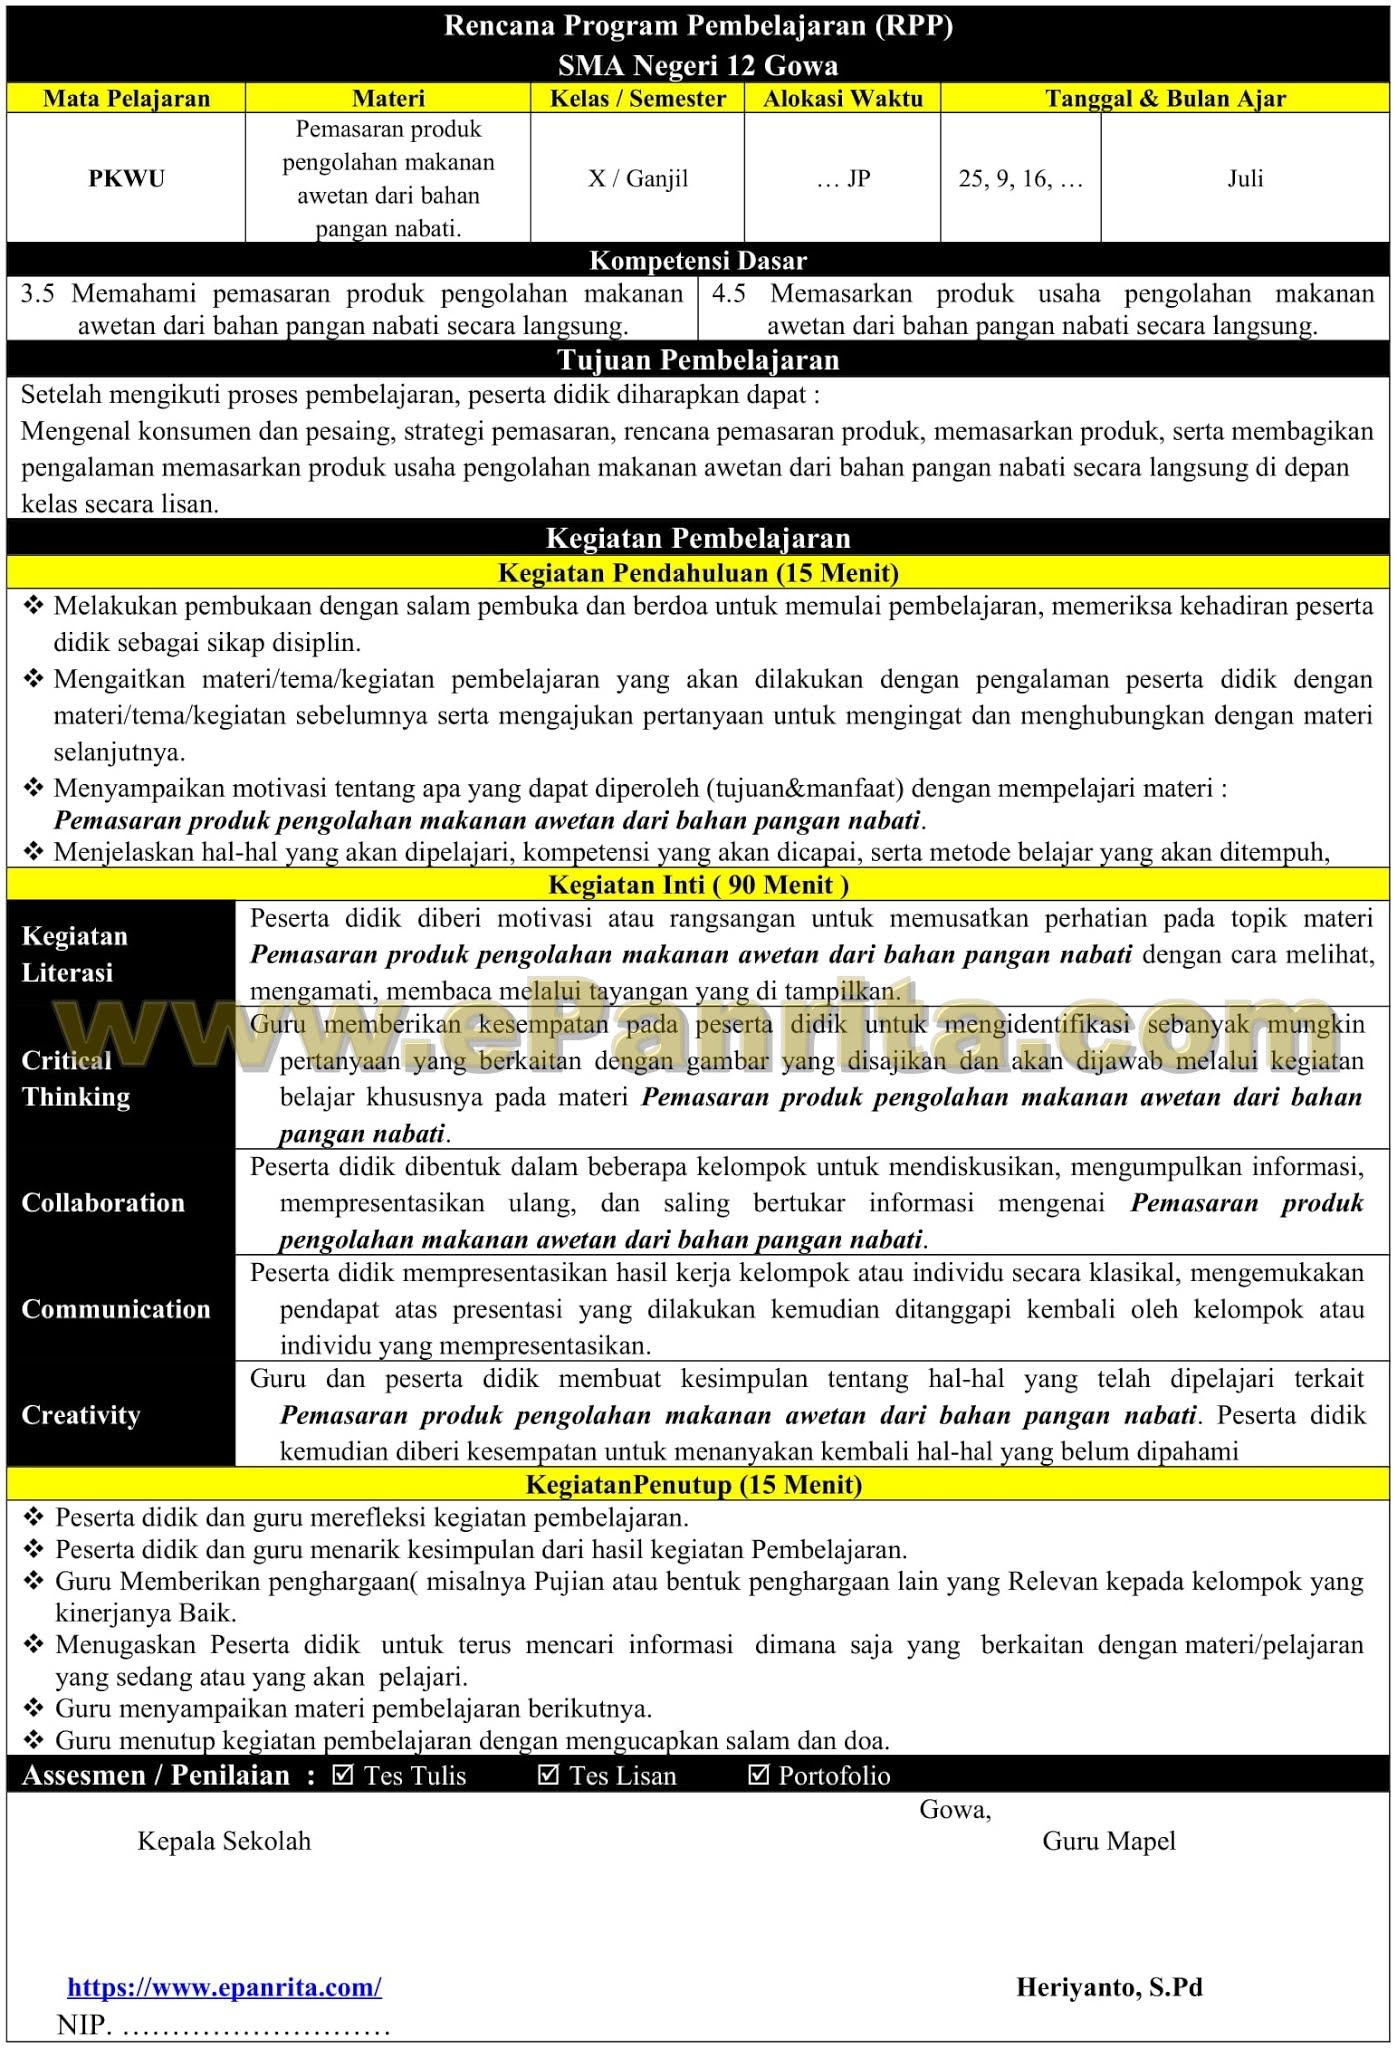 RPP 1 Halaman Prakarya Aspek Pengolahan (Pemasaran produk pengolahan makanan awetan dari bahan pangan nabati)